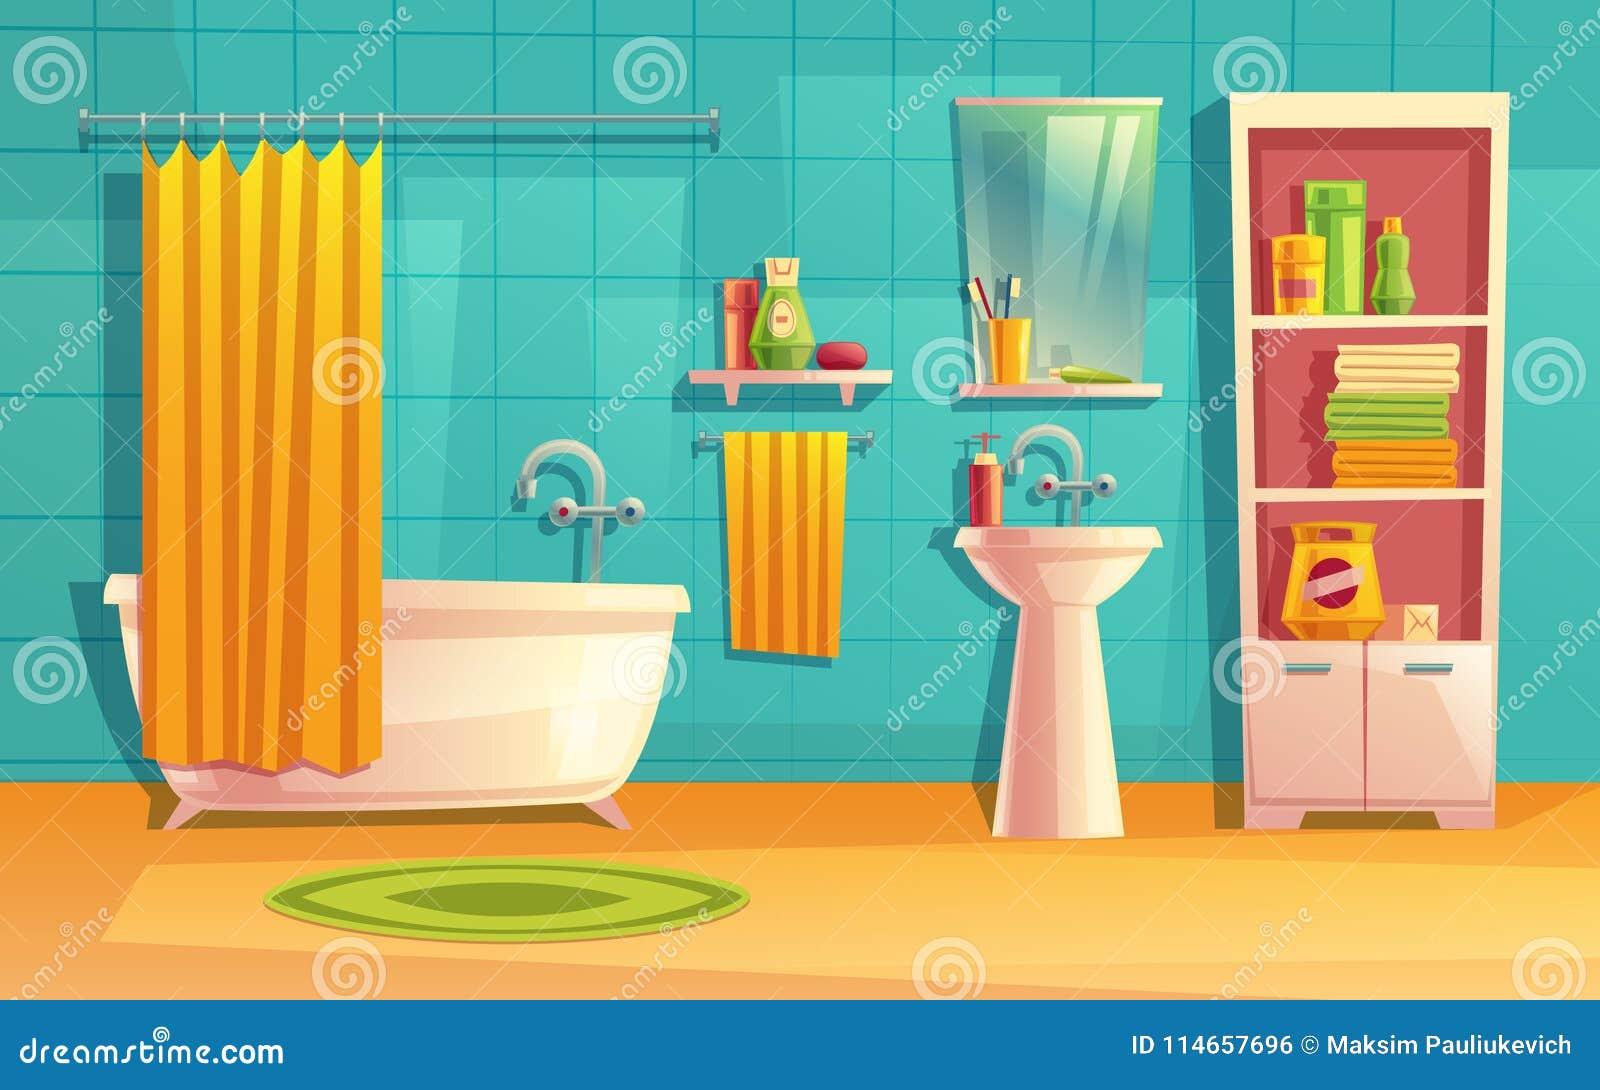 Vector Bathroom Interior, Room With Furniture, Bathtub Stock Vector ...